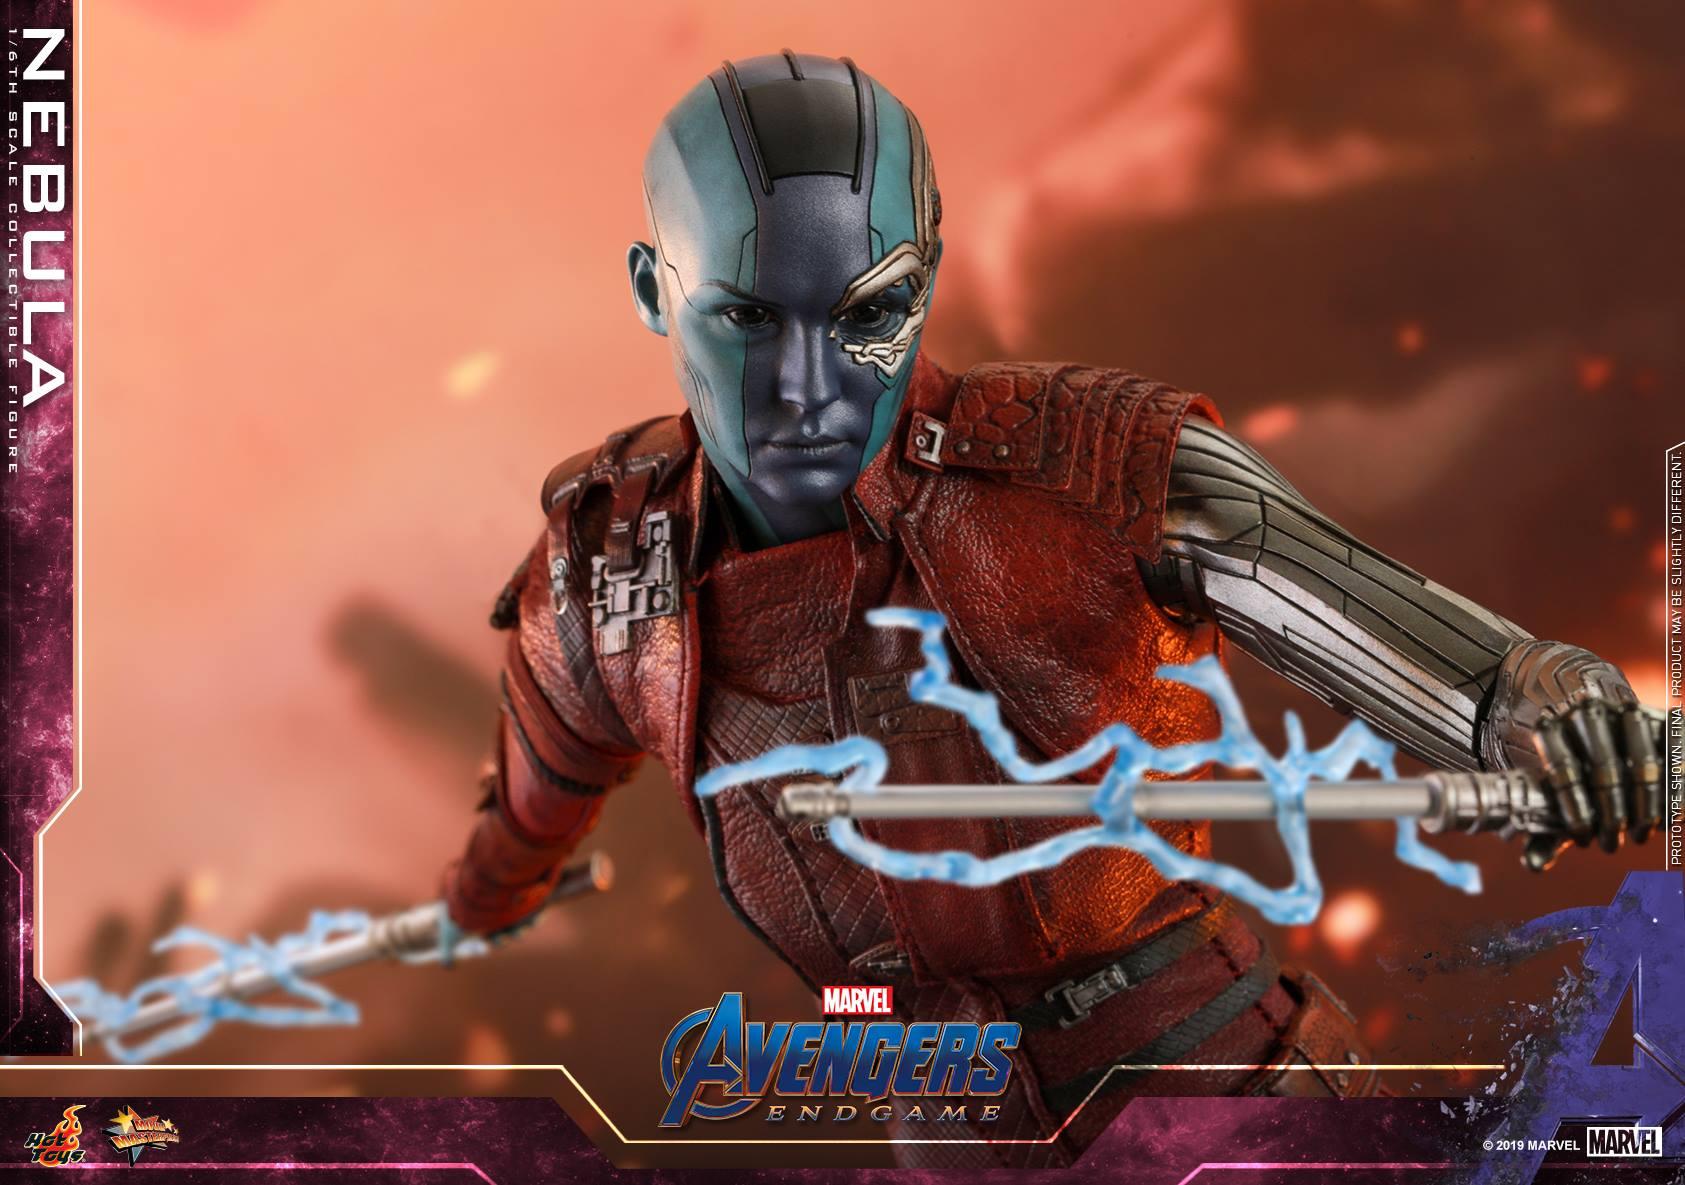 szmk_avengers_endgame_vegjatek_bosszuallok_marvel_nebula_warmaschine_harcigep_5.jpg